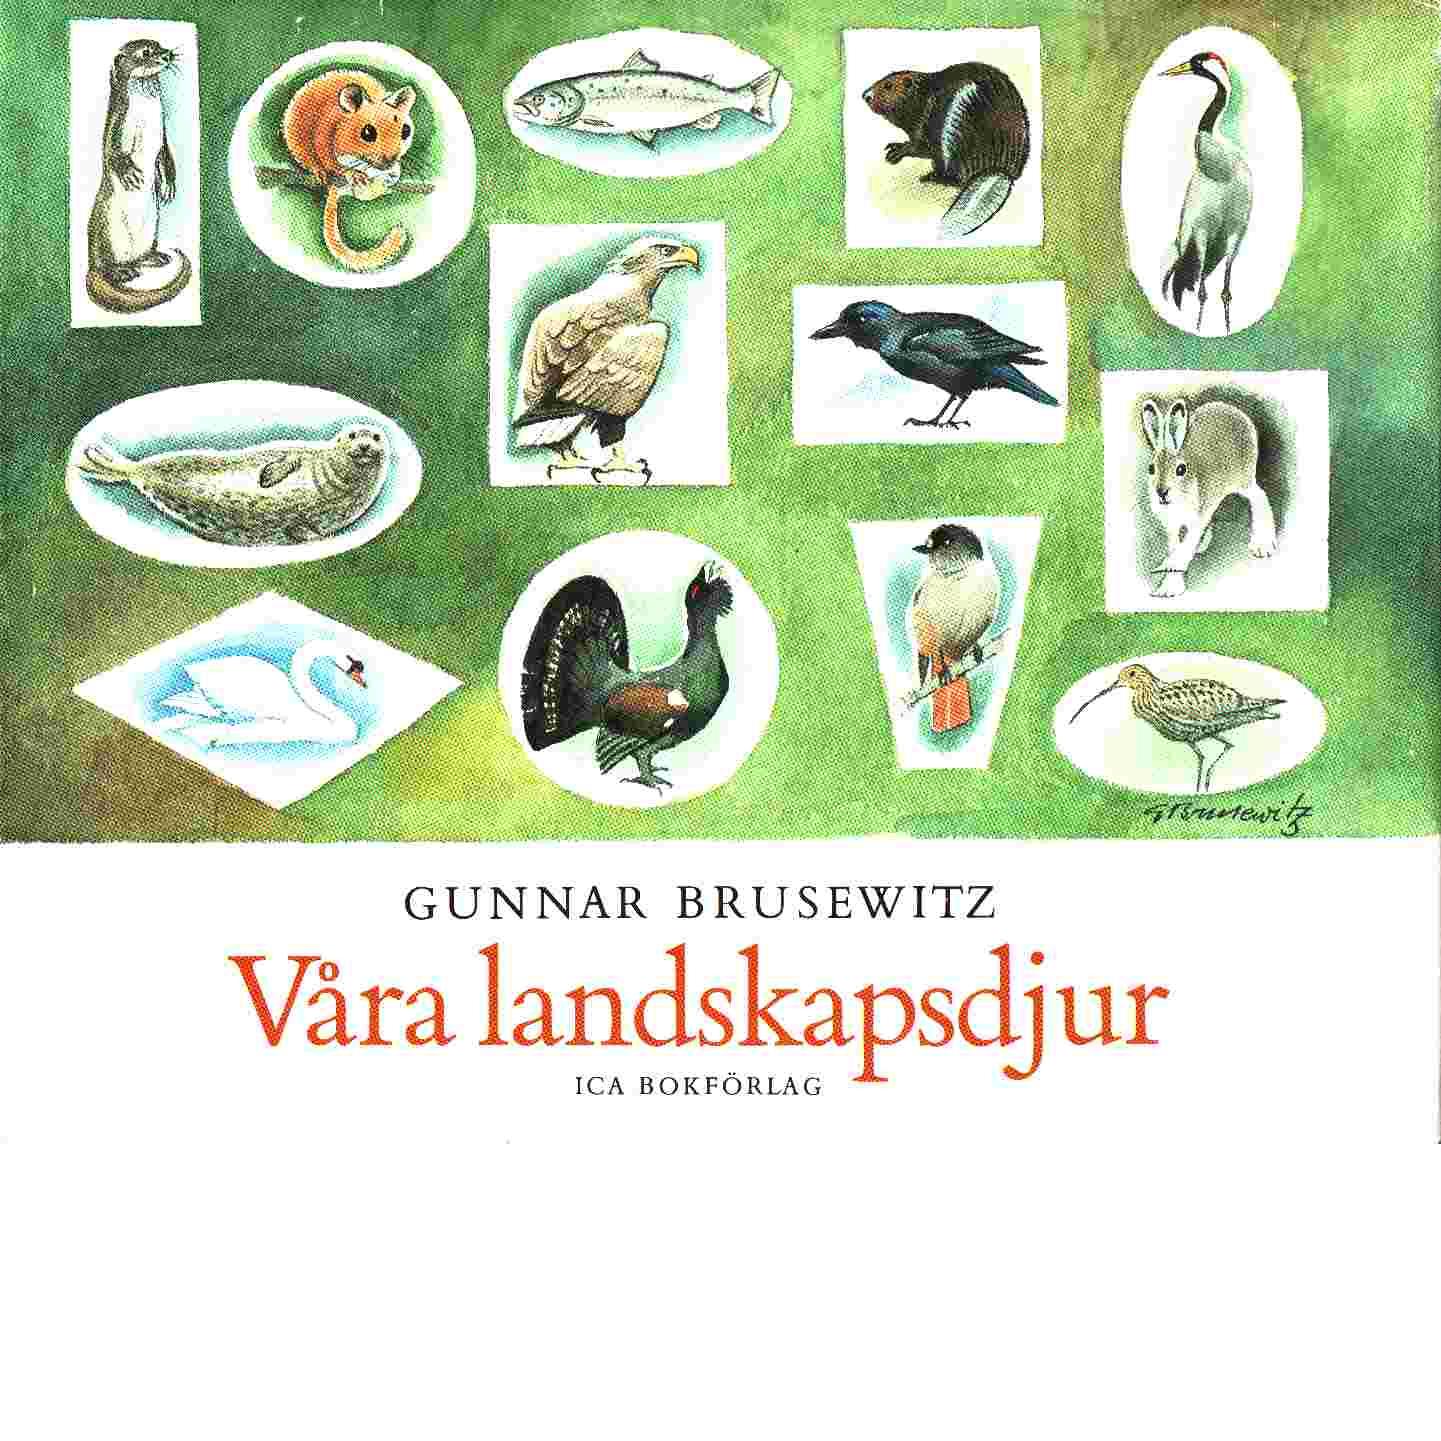 Våra landskapsdjur - Brusewitz, Gunnar